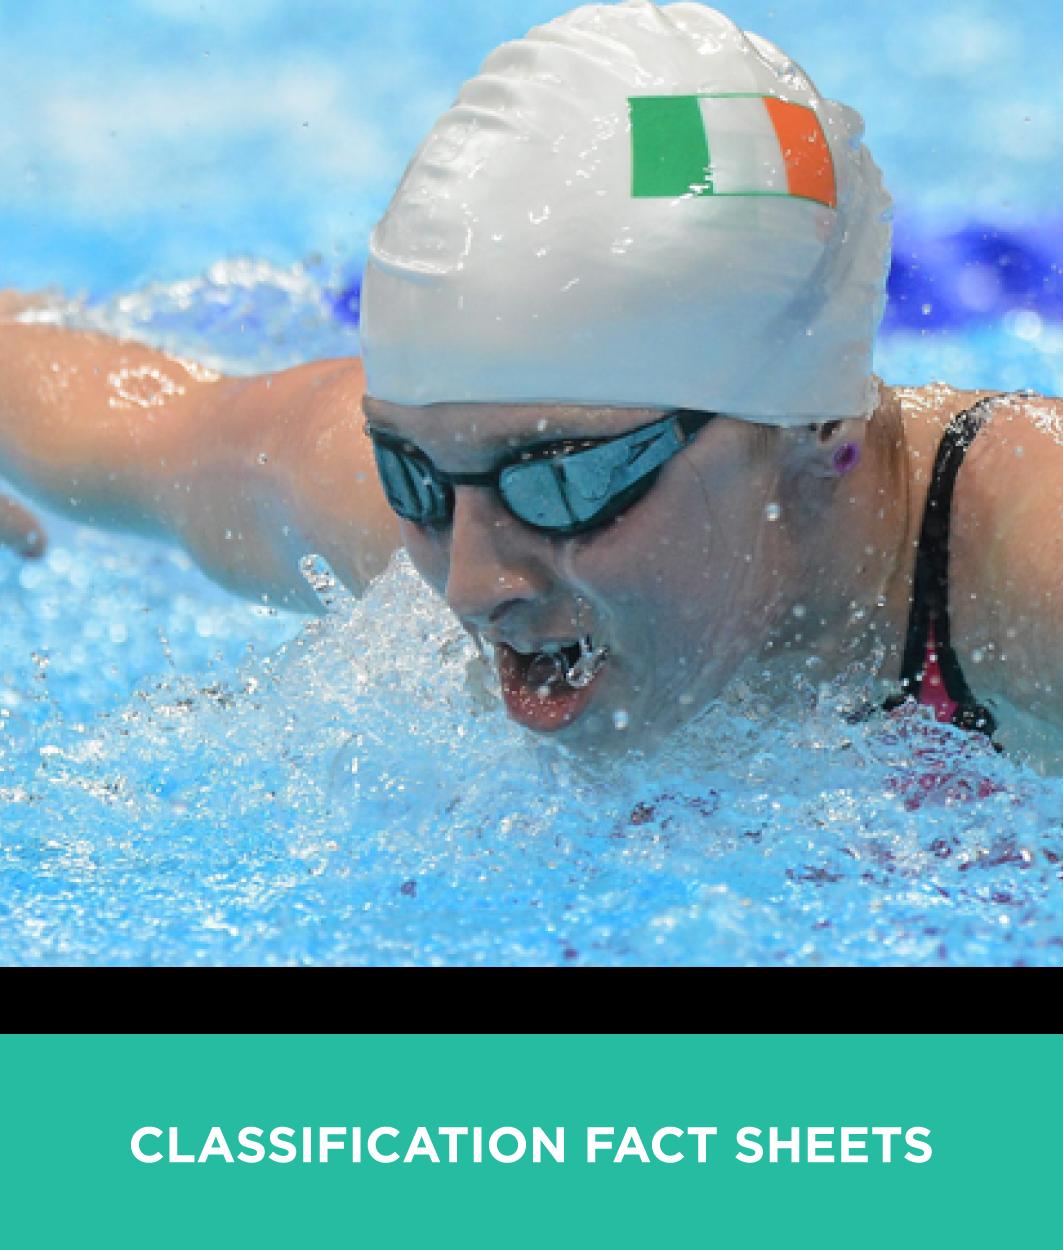 Classification_images_FactSheets.png